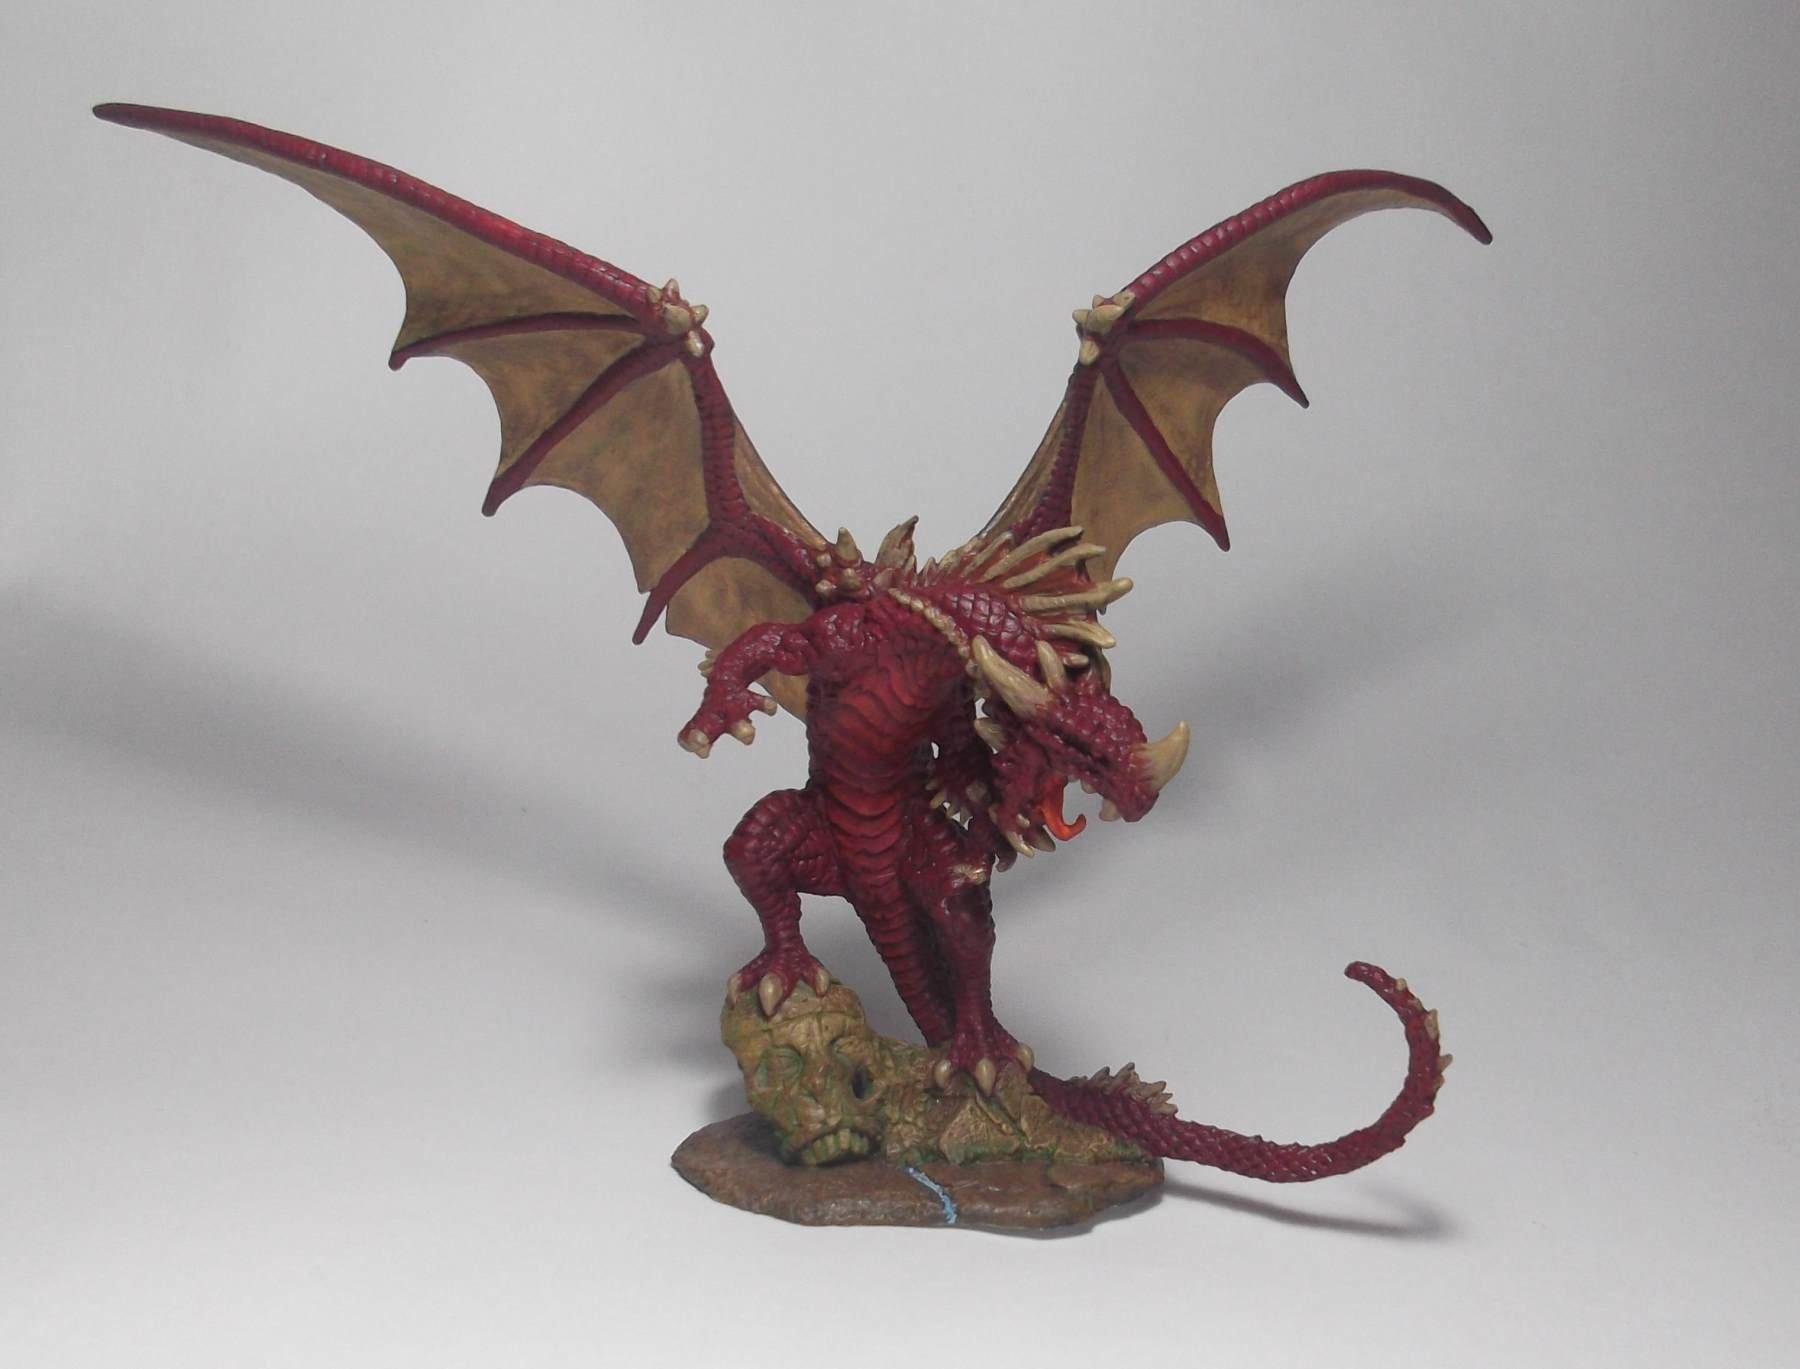 Pathfinder Red Dragon